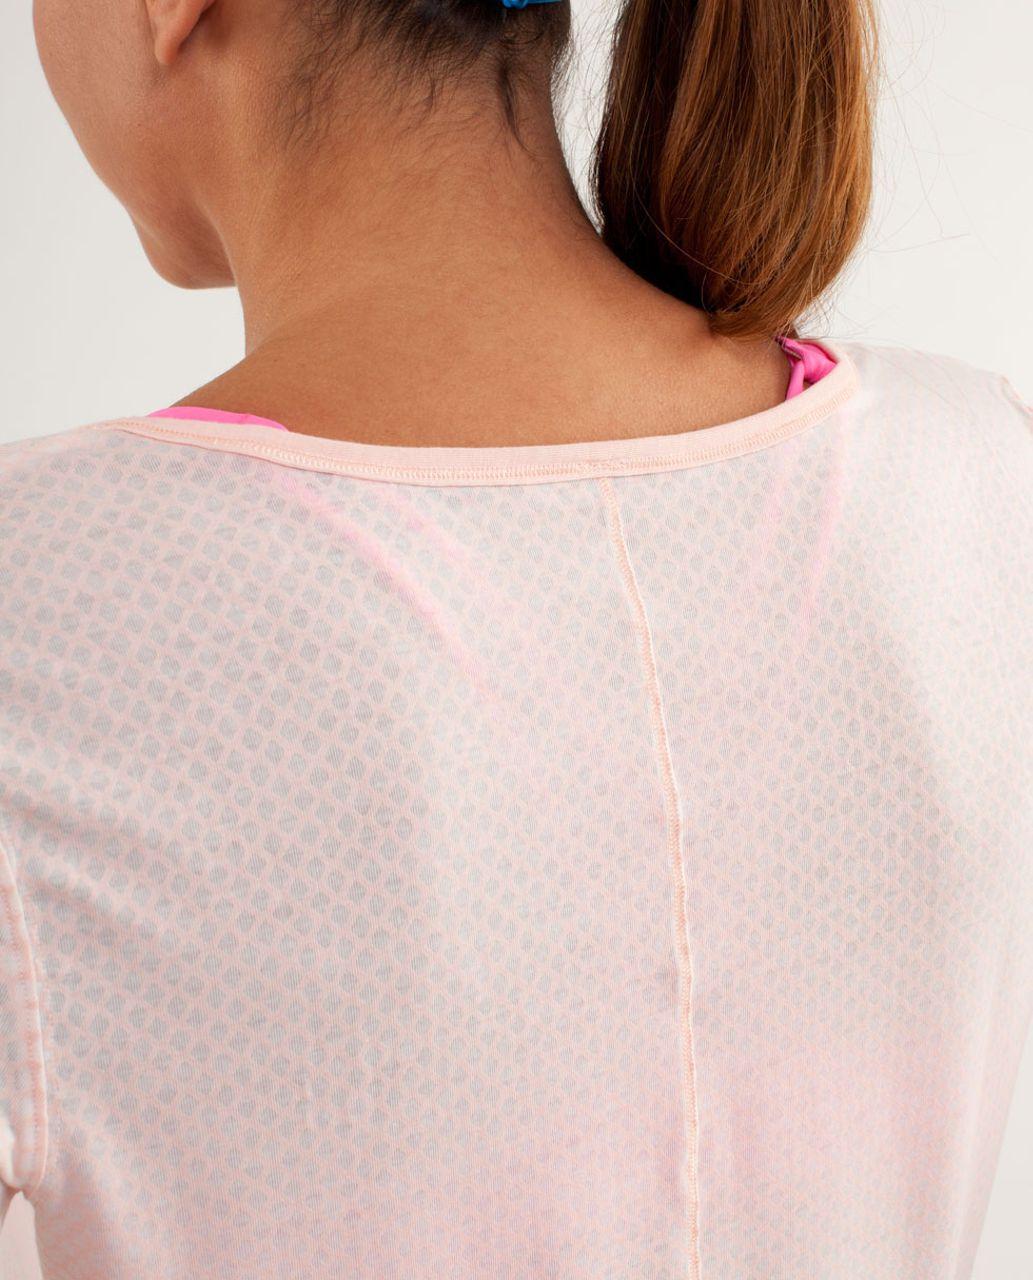 Lululemon Drish Tee - Mesh Burnout Parfait Pink / Parfait Pink